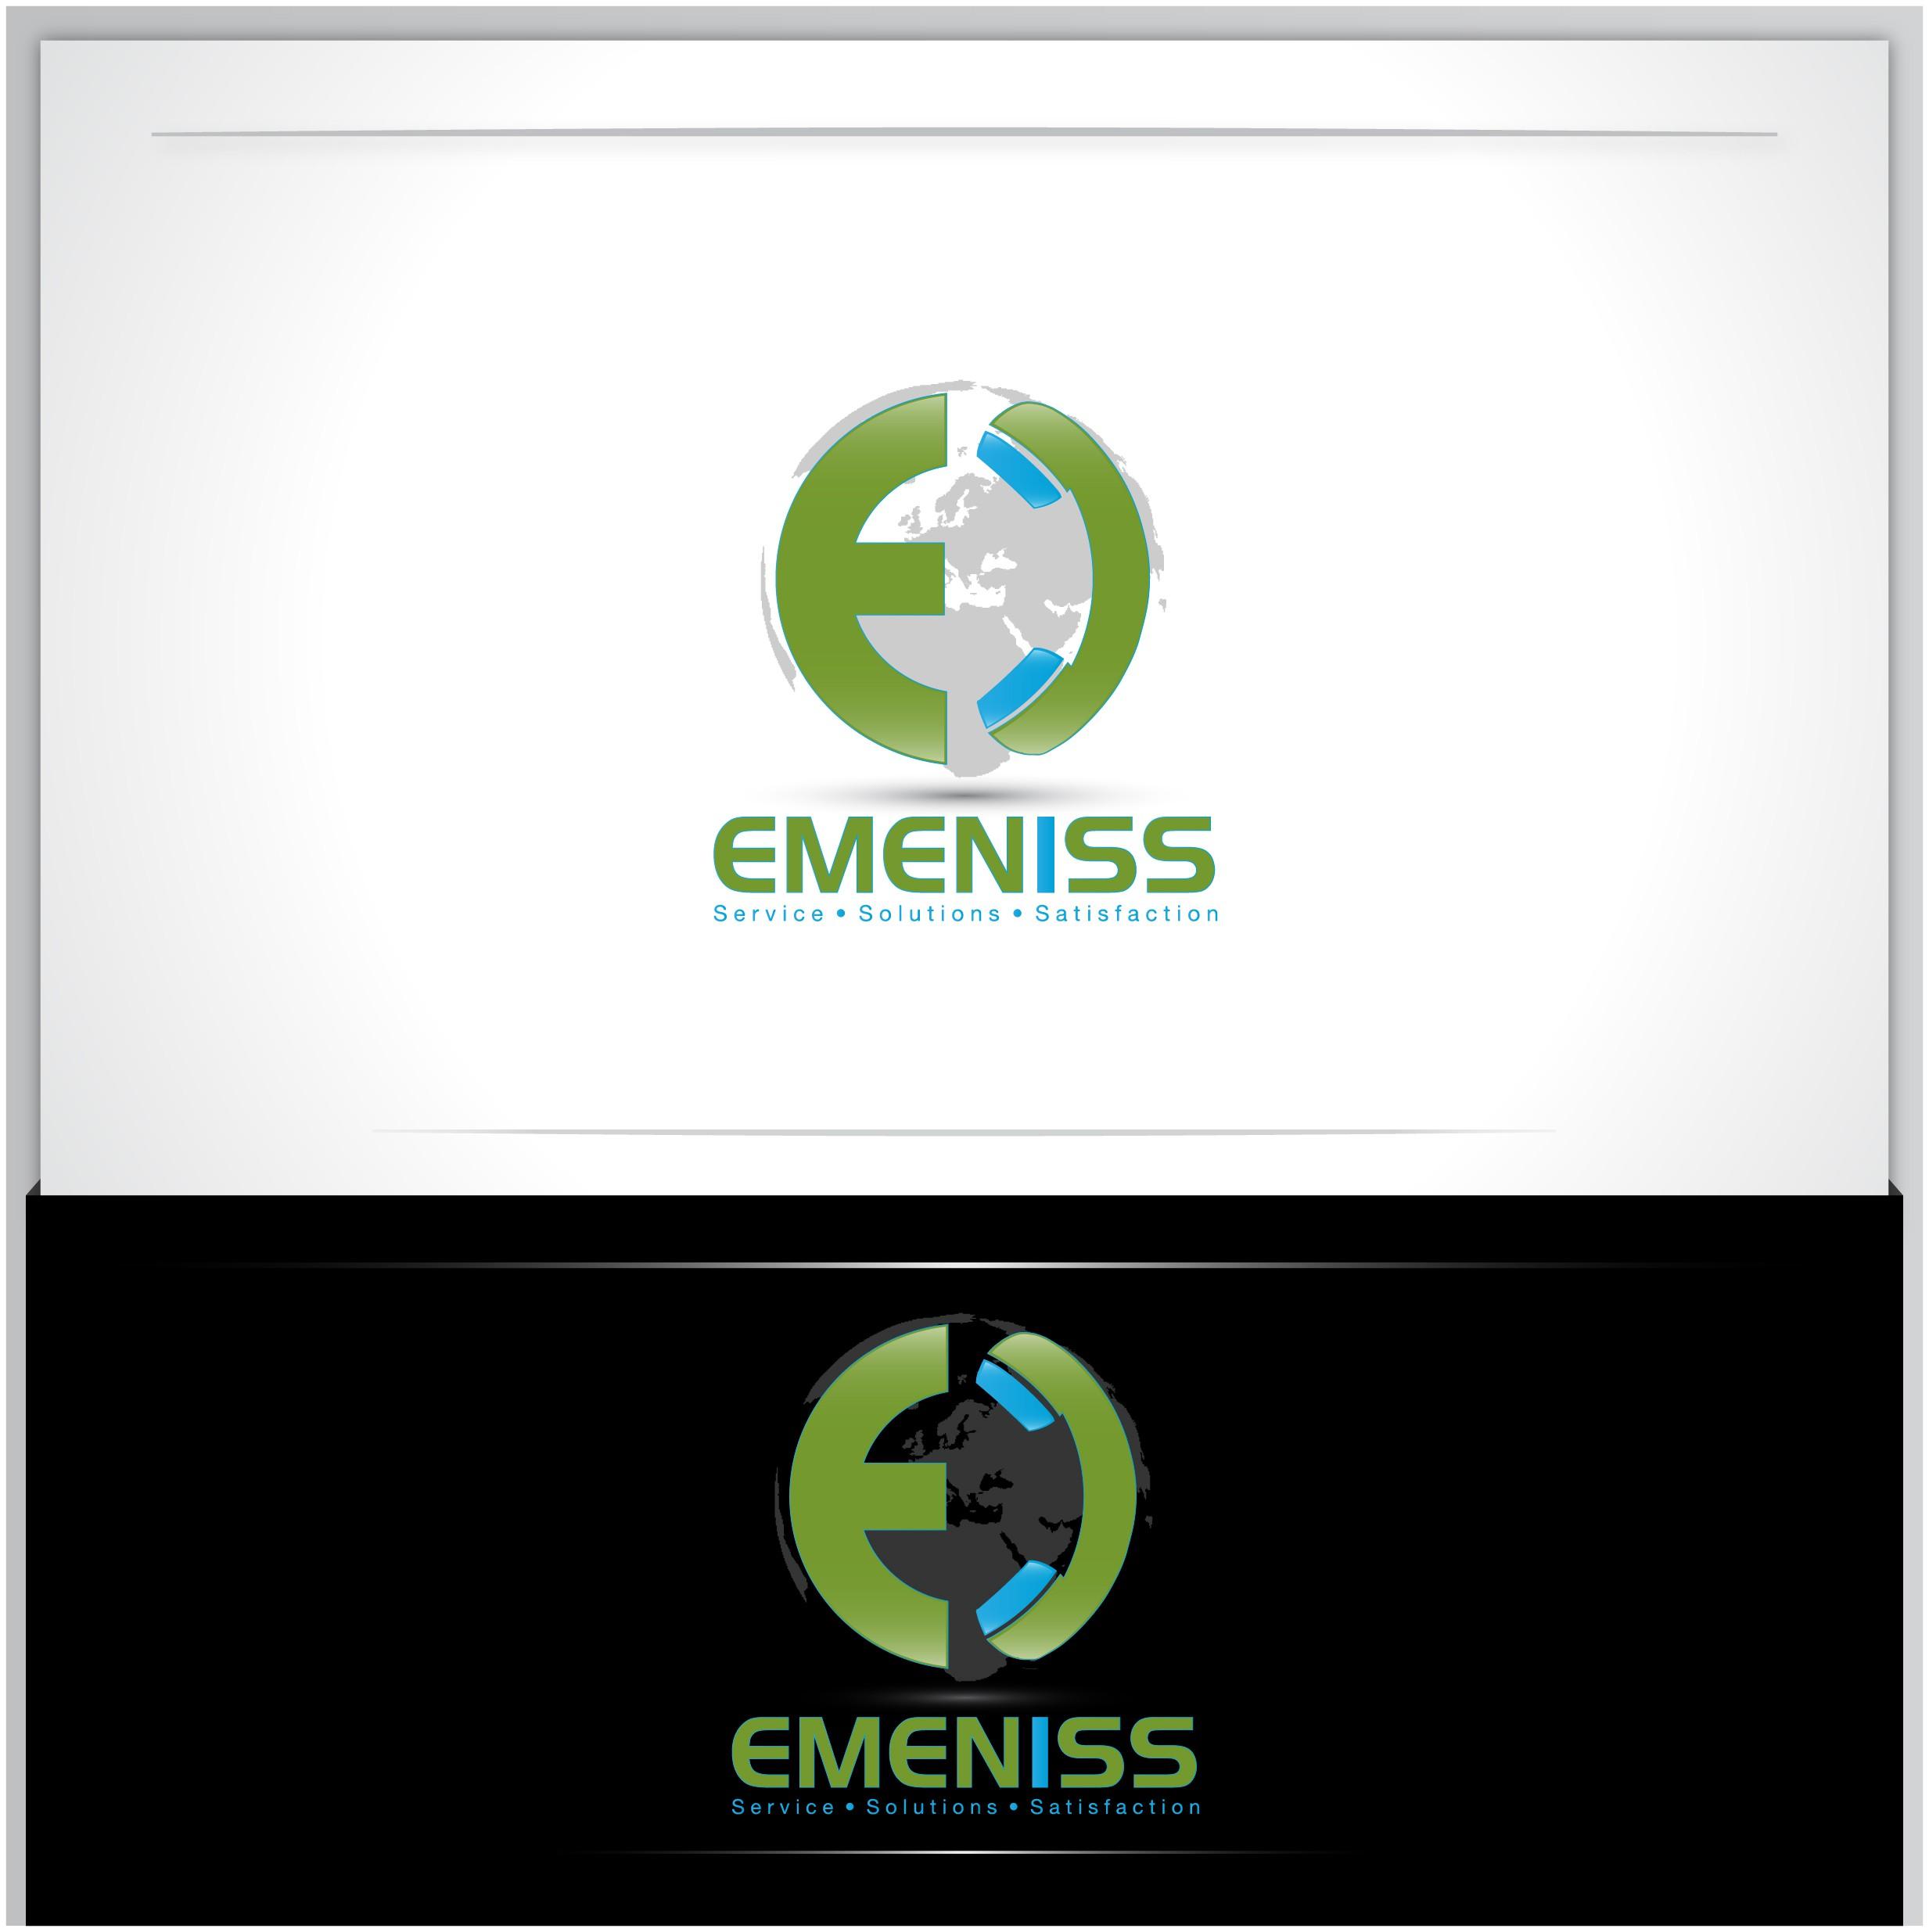 Emeniss